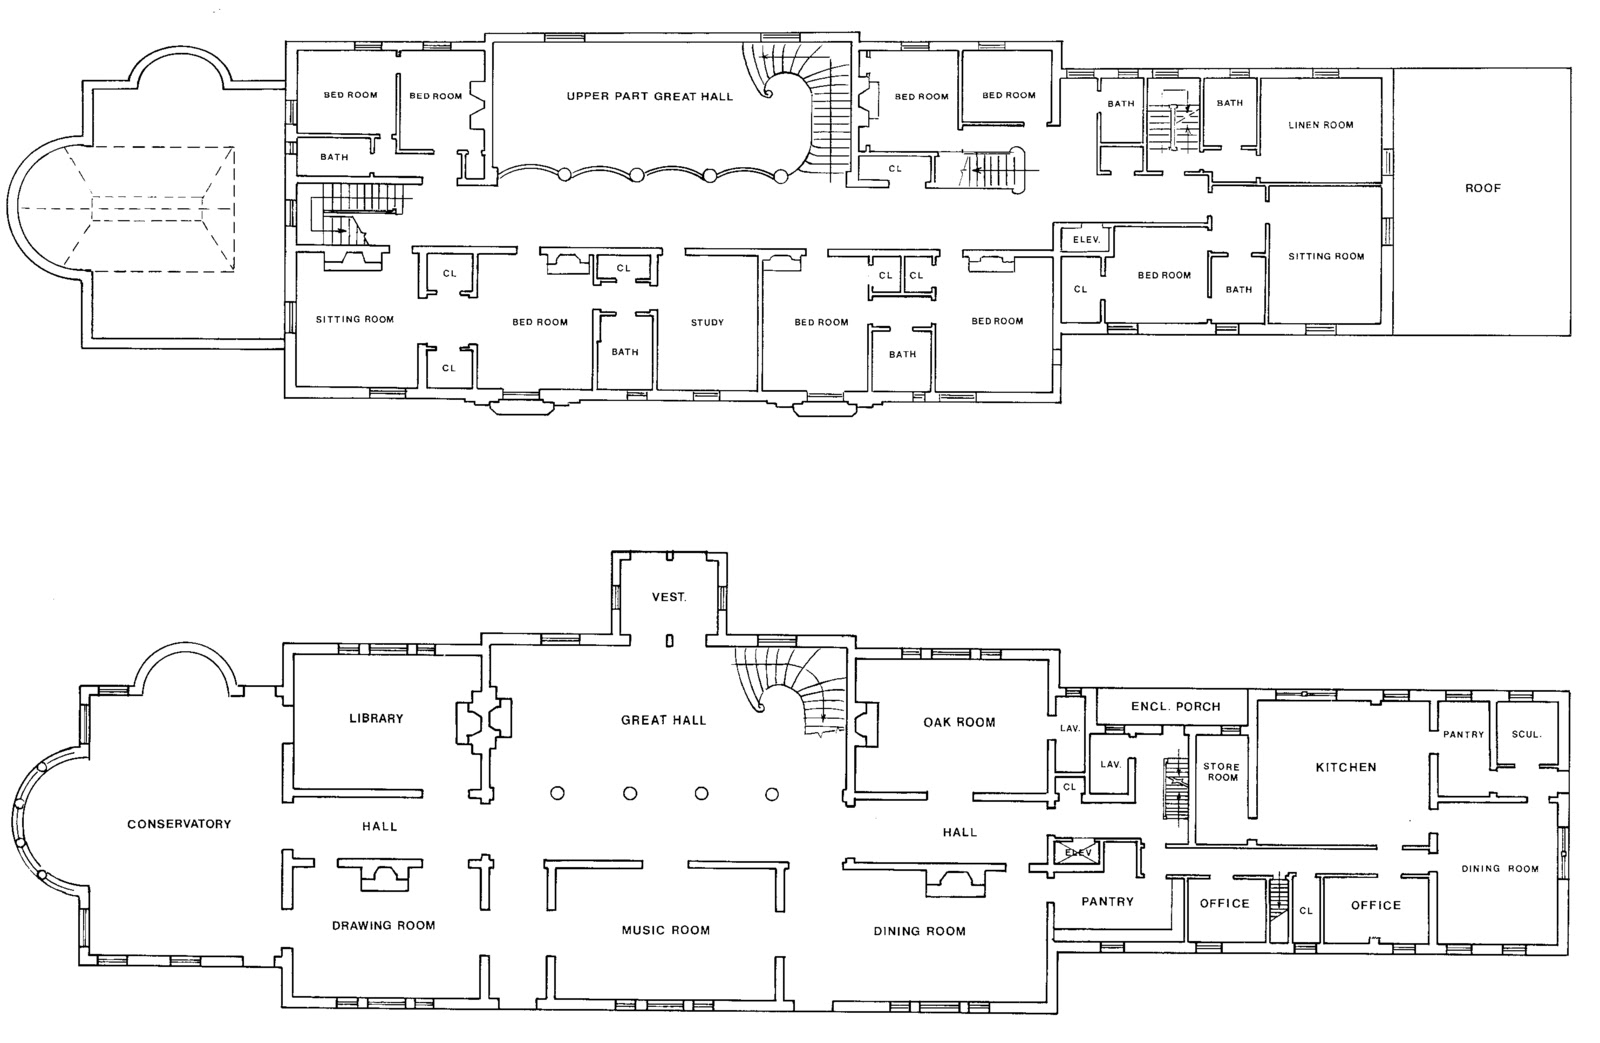 mansion floor plan tif 1600 1043 floor plans pinterest mansion floor plan tif 1600 1043 floor plans pinterest architecture